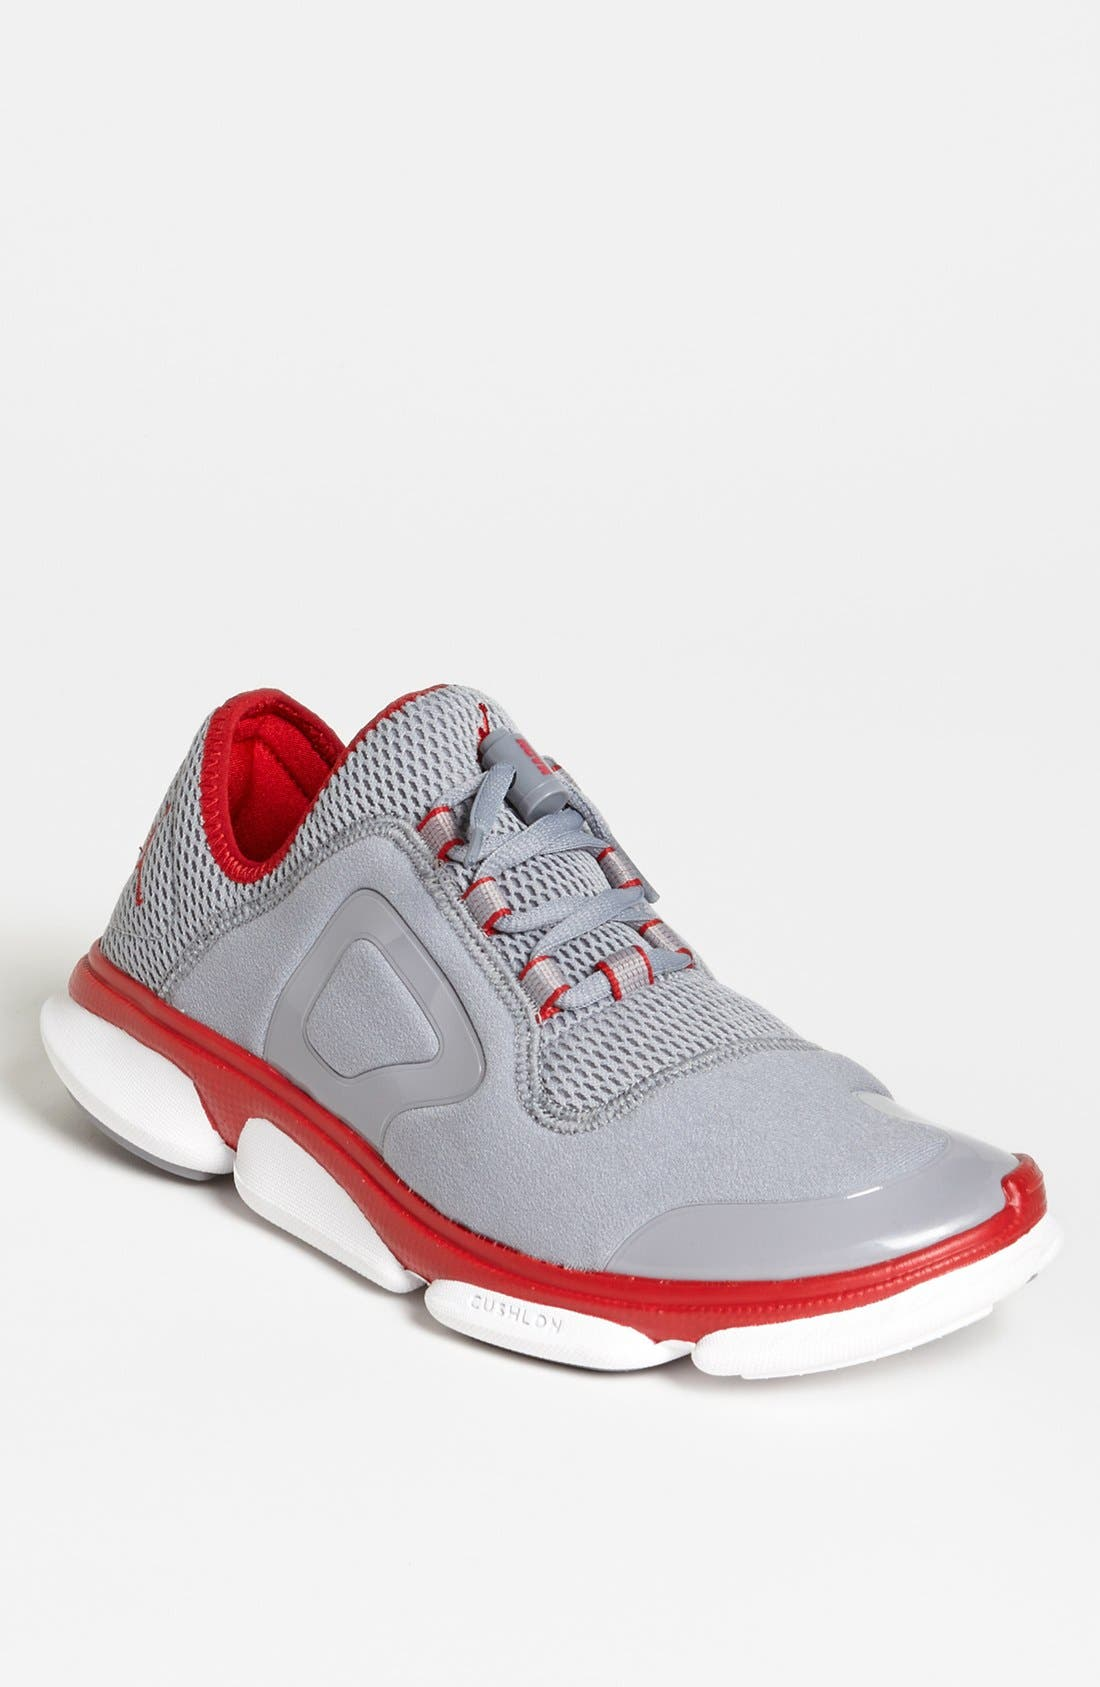 Main Image - Nike 'Jordan RCVR 2' Training Shoe (Men)